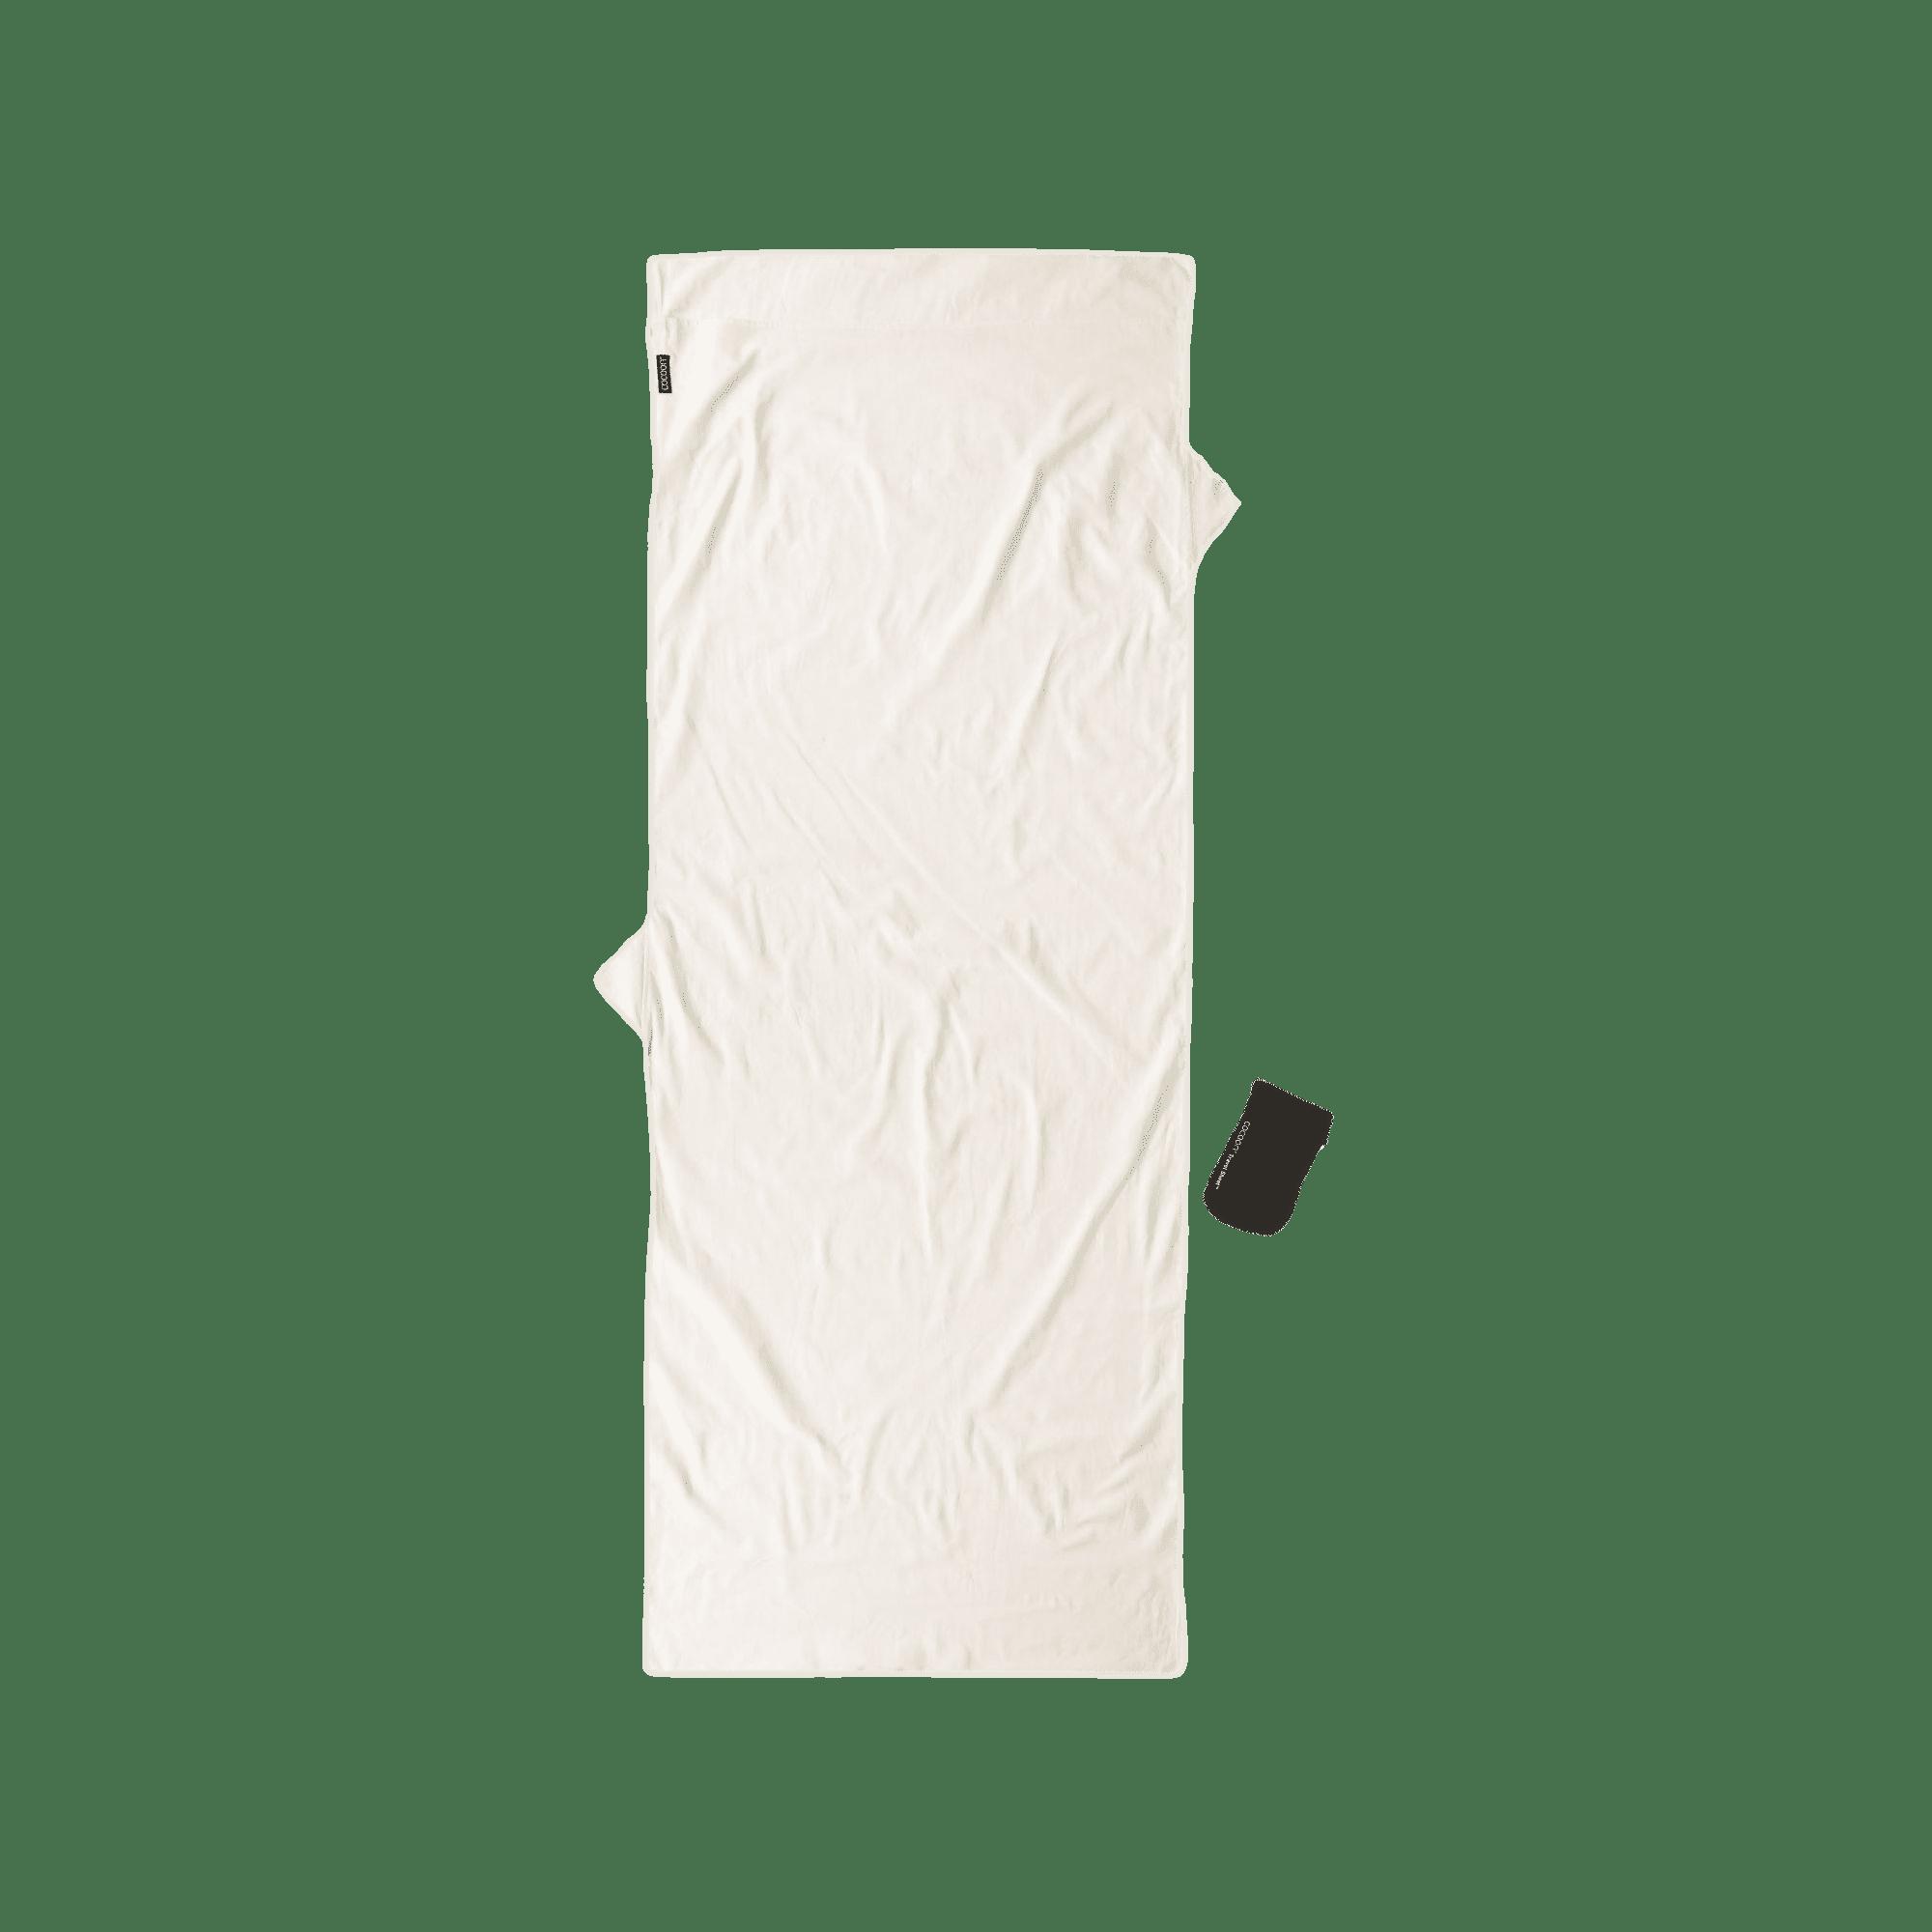 Travelsheet cotton 1p